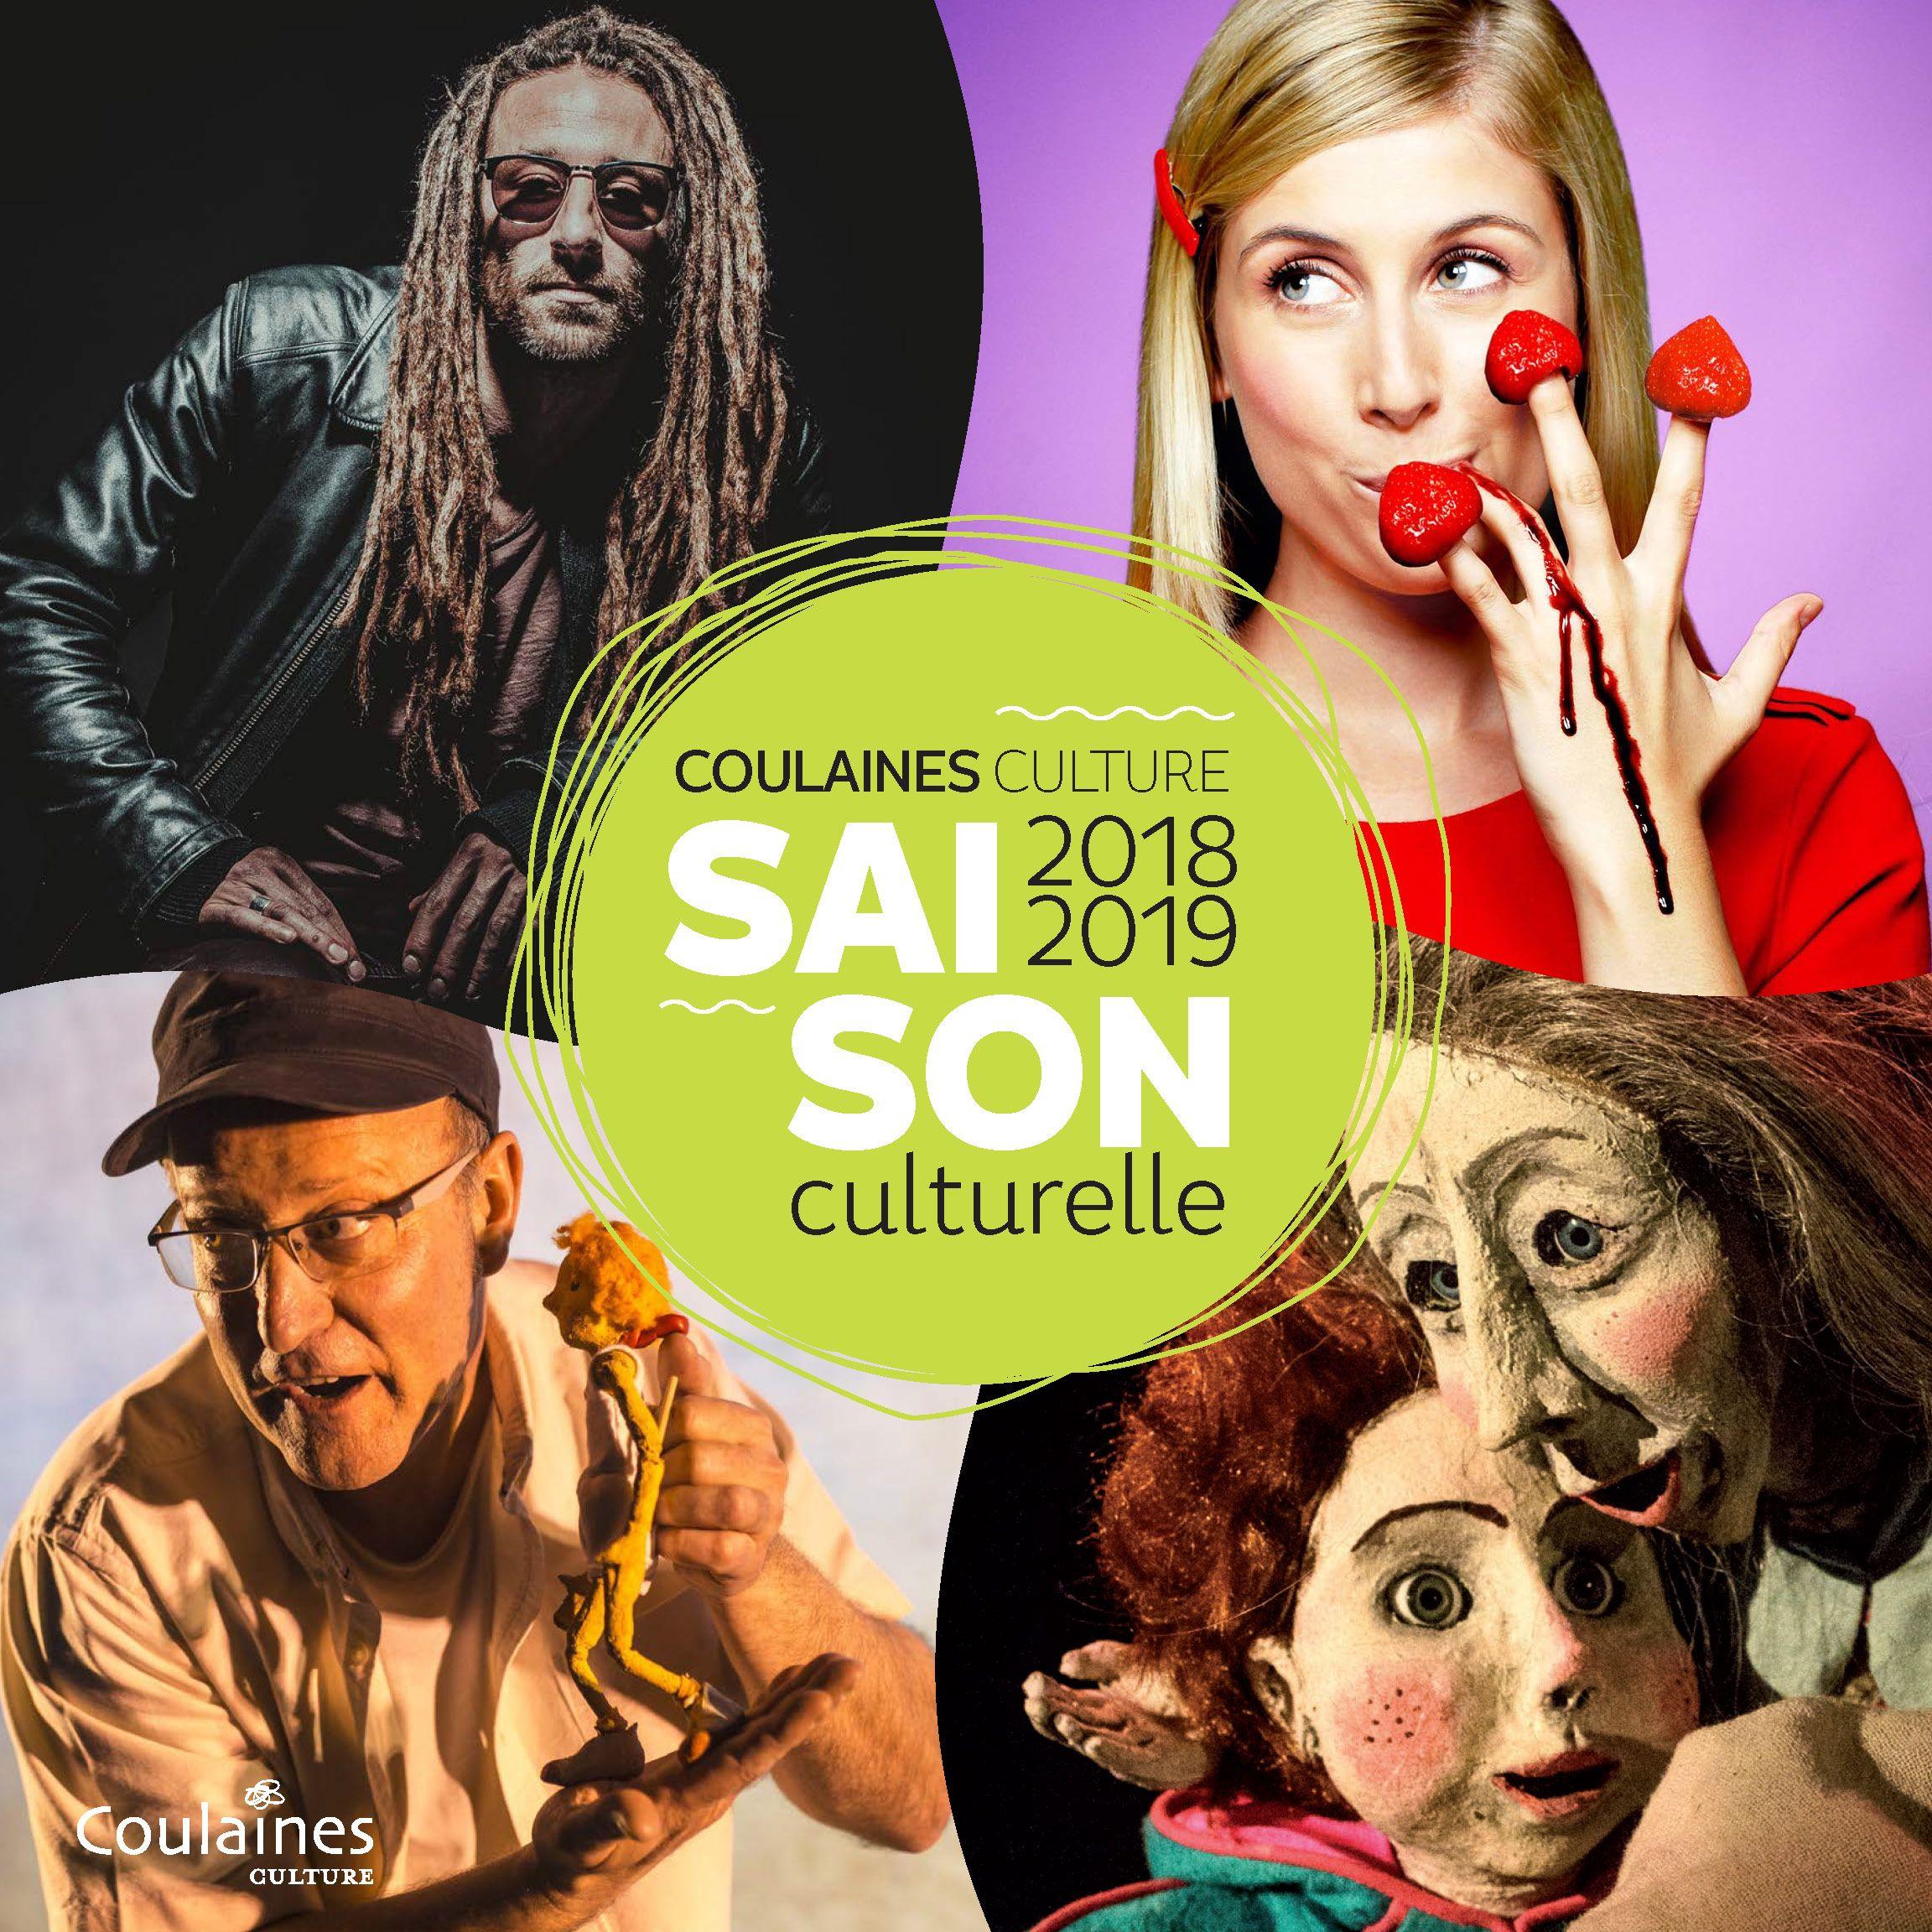 Couv_Agenda culturel Coulaines 2018-19